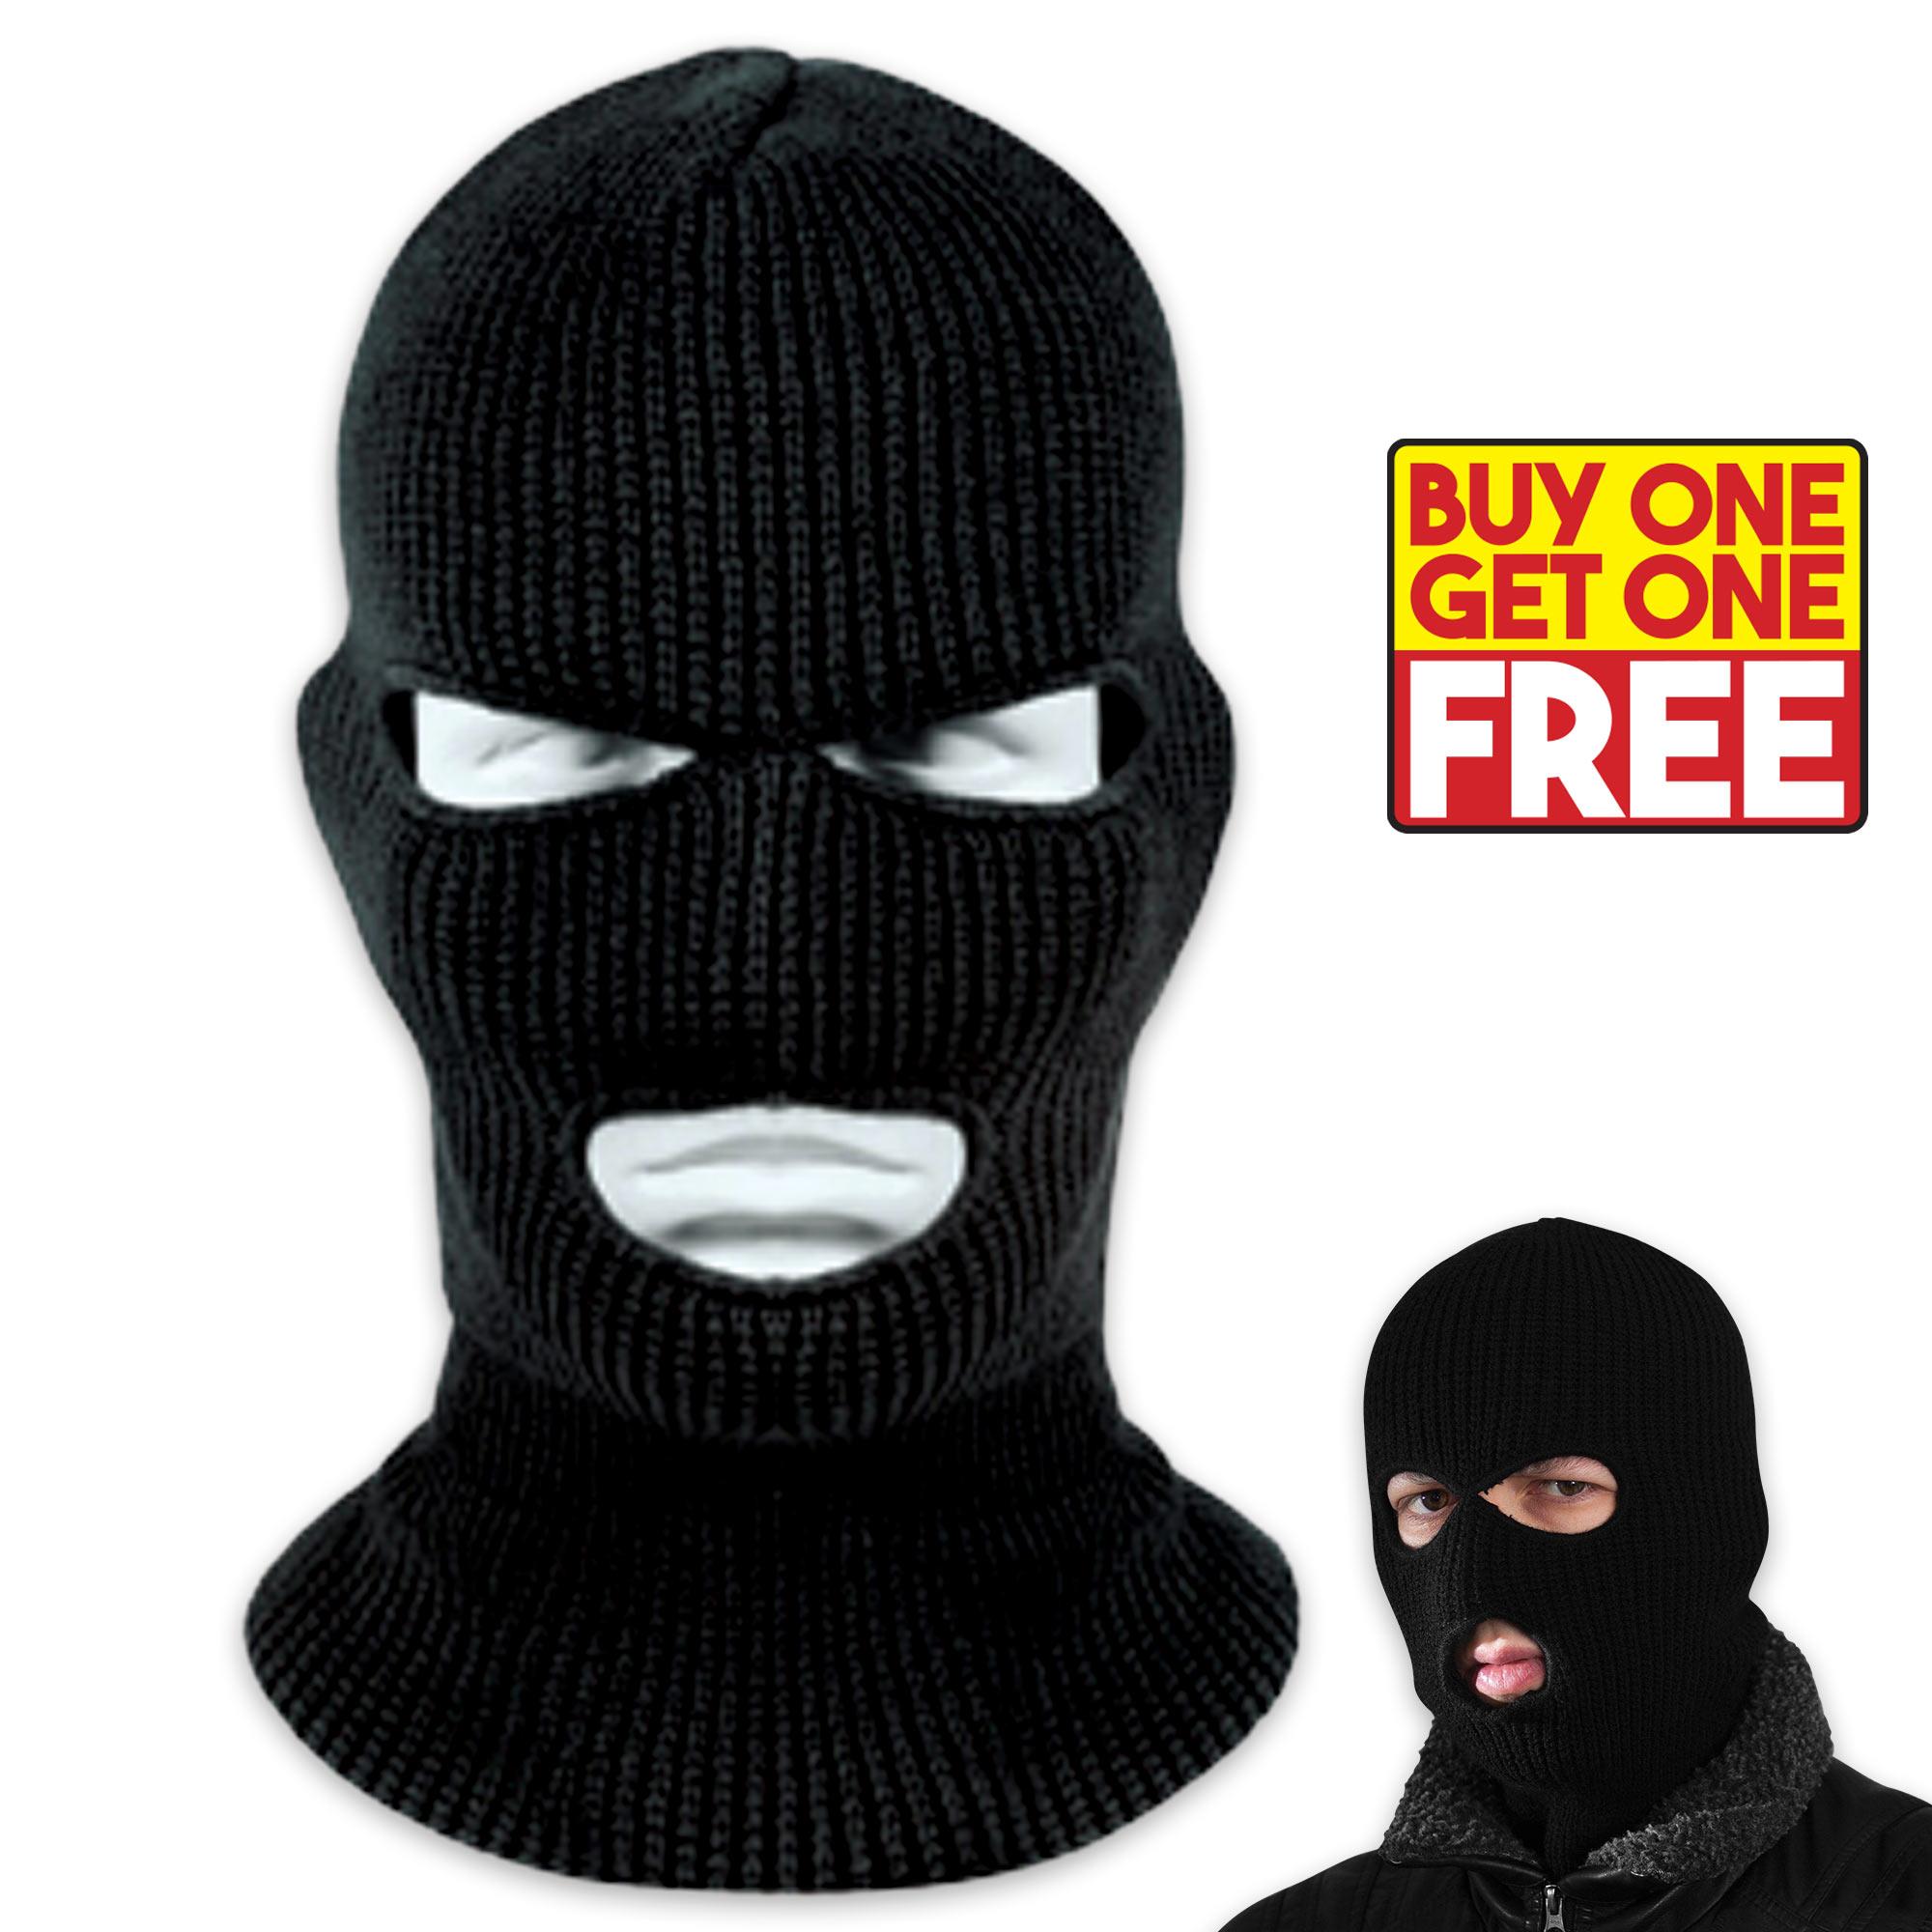 Knit Acrylic Ski Mask   3-Hole Facemask - Black - BOGO  3a15150ff